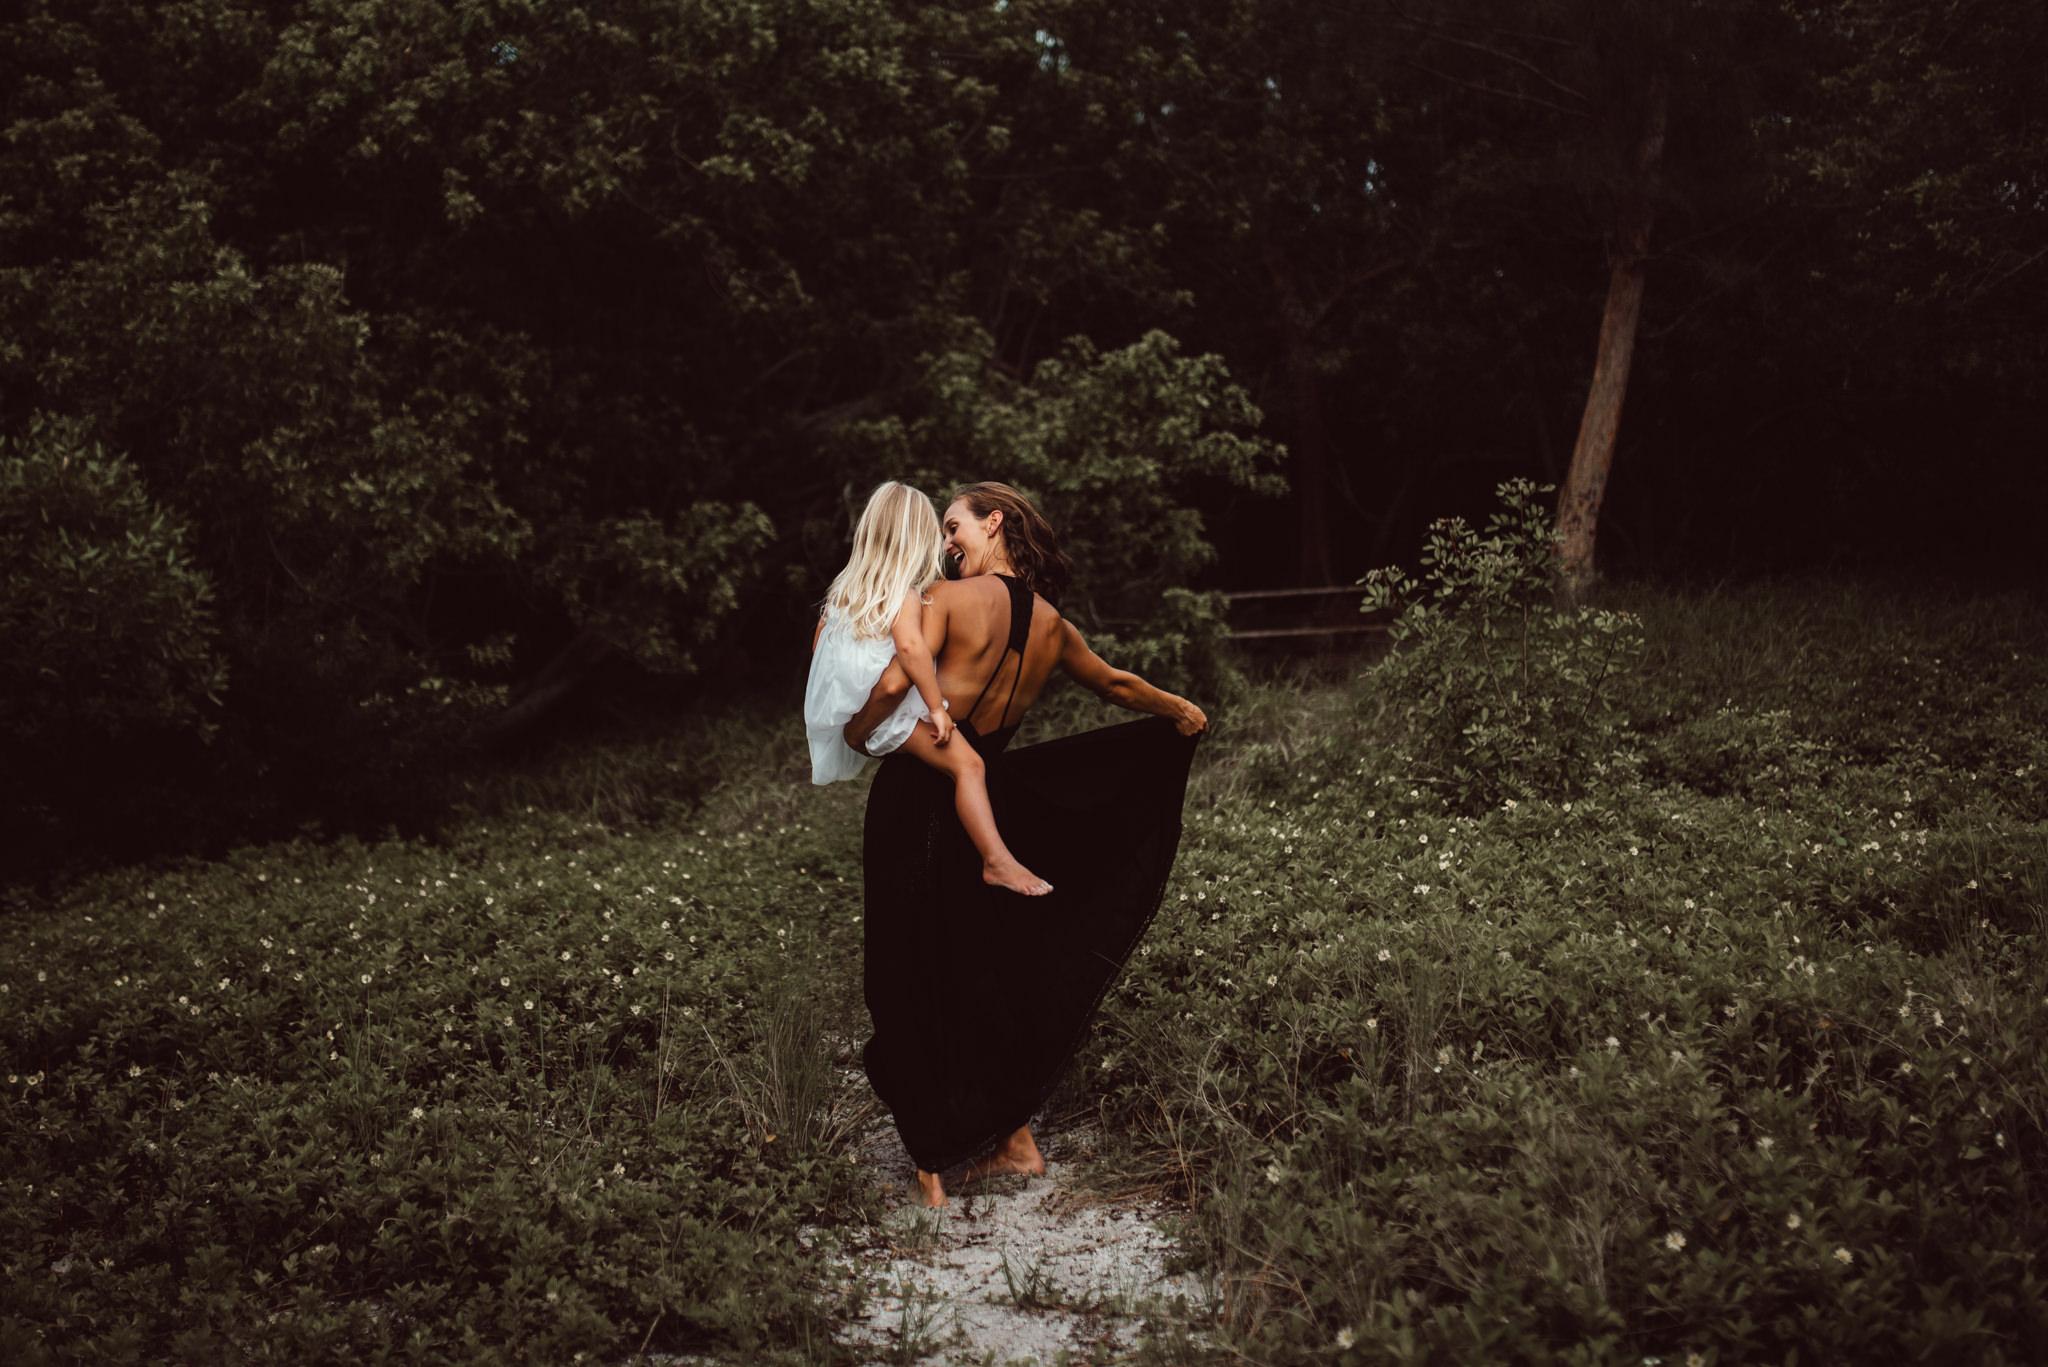 twyla jones photography - treasure coast florida - island family session-4964.jpg